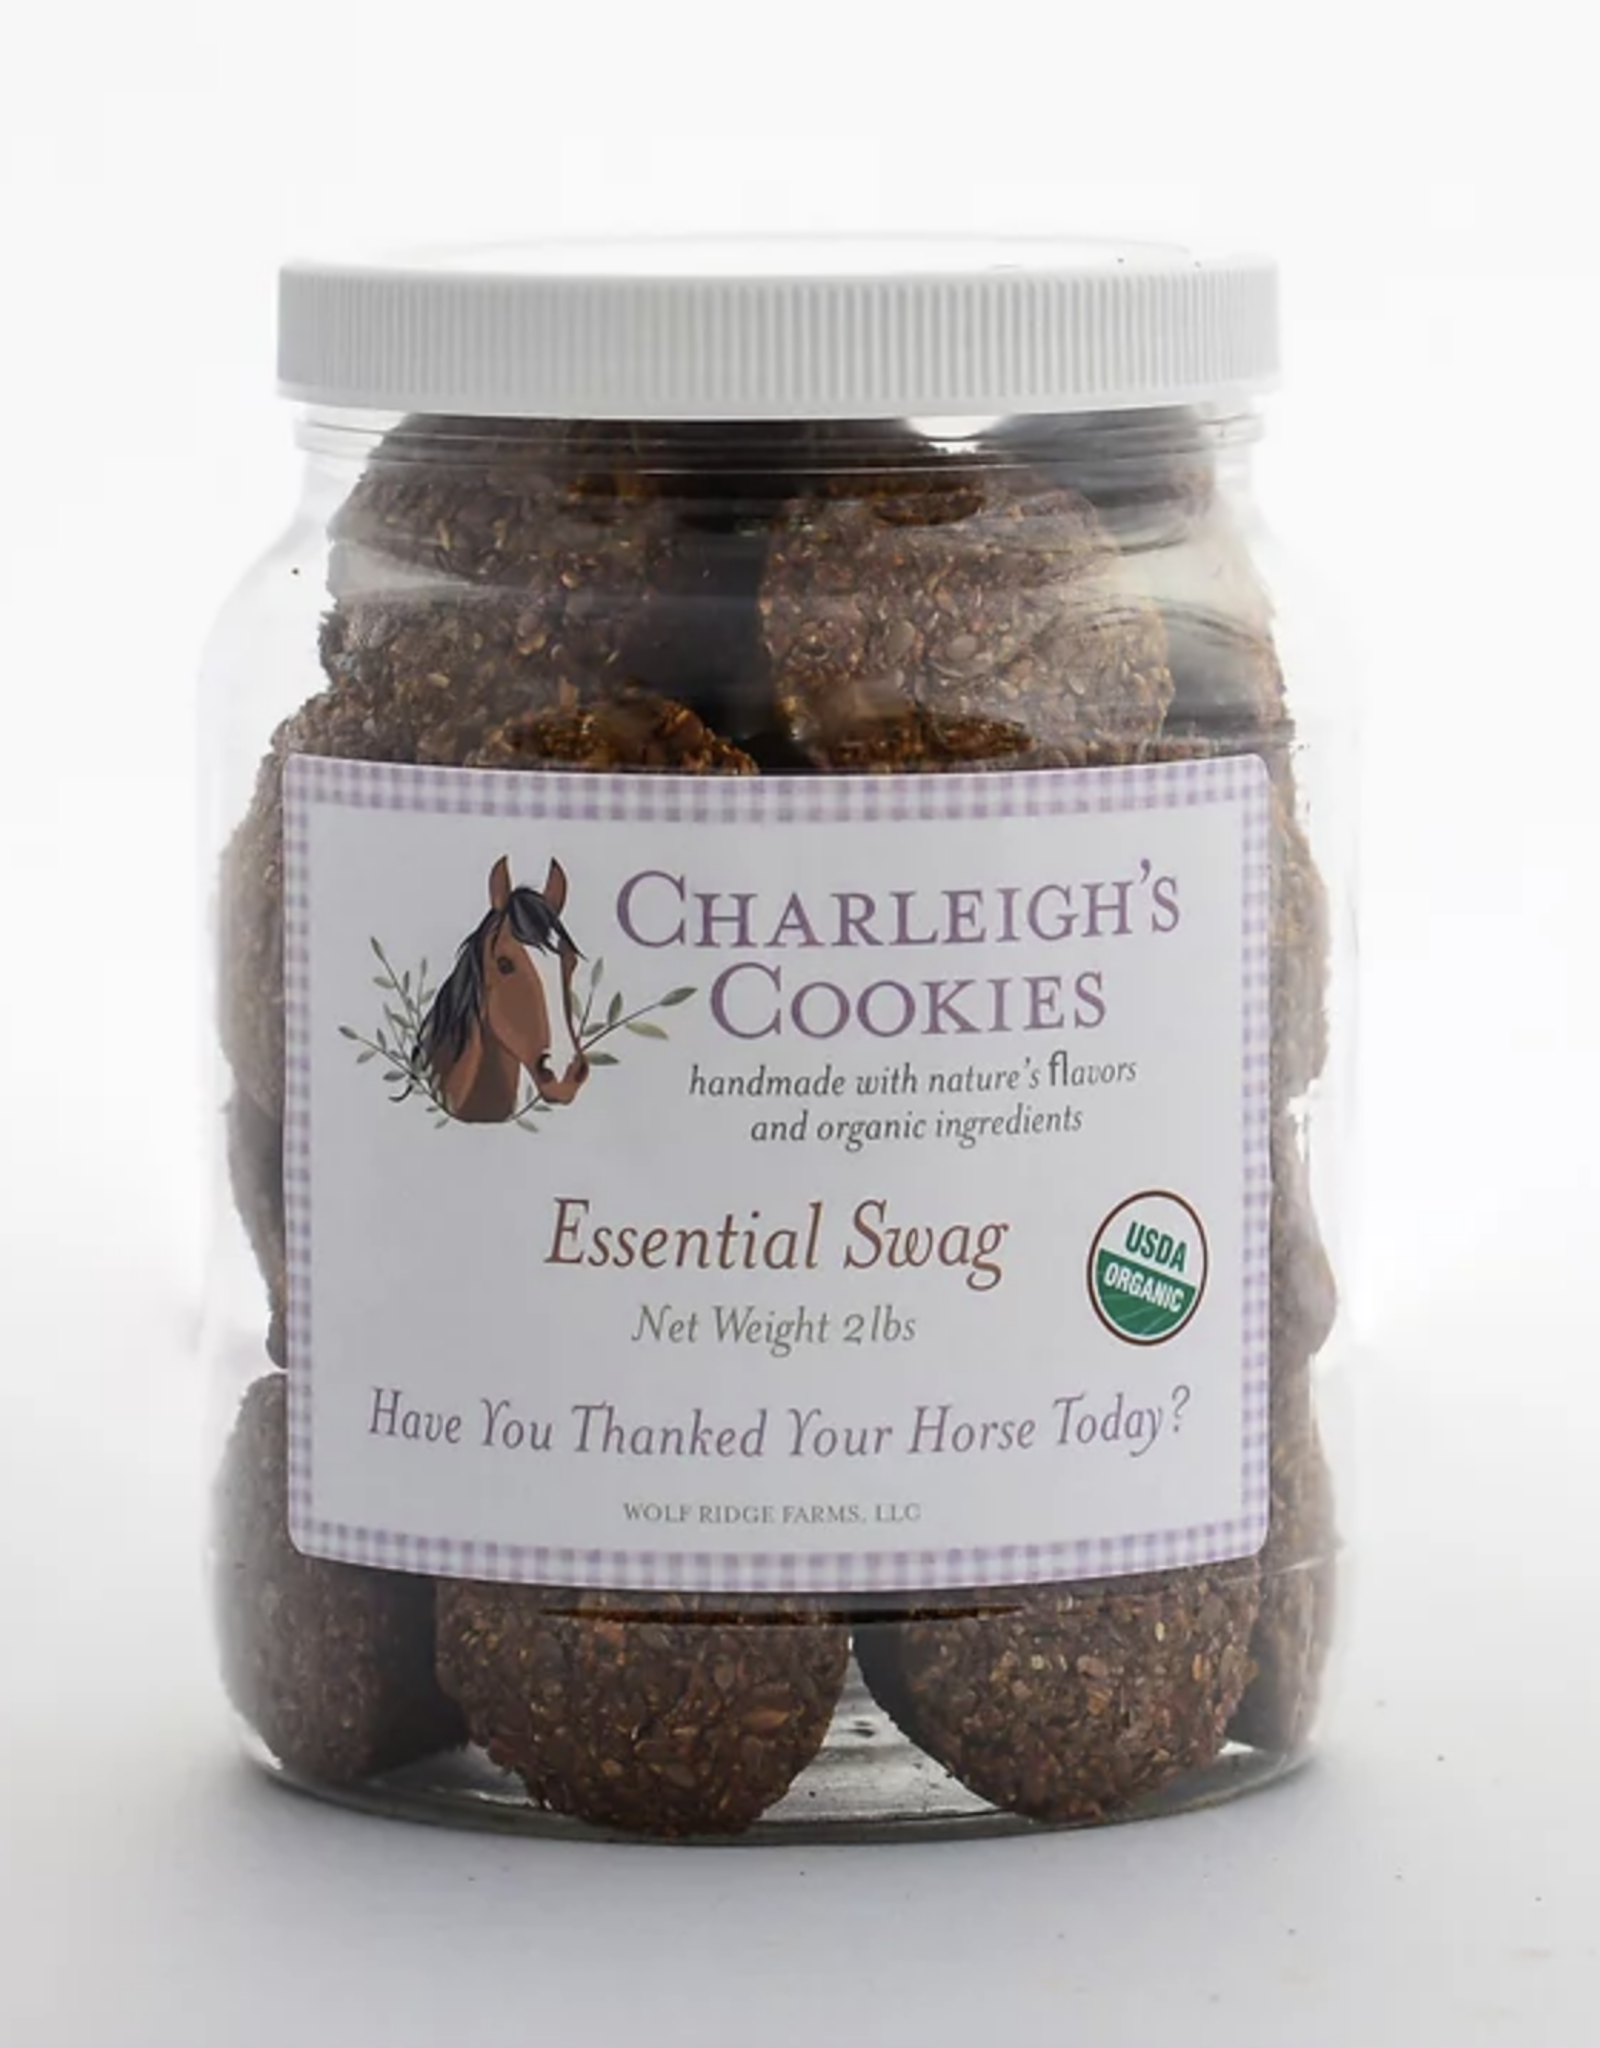 Charleigh's Cookies Charleigh's Cookies Essential Swag 2lb Cookie Jar